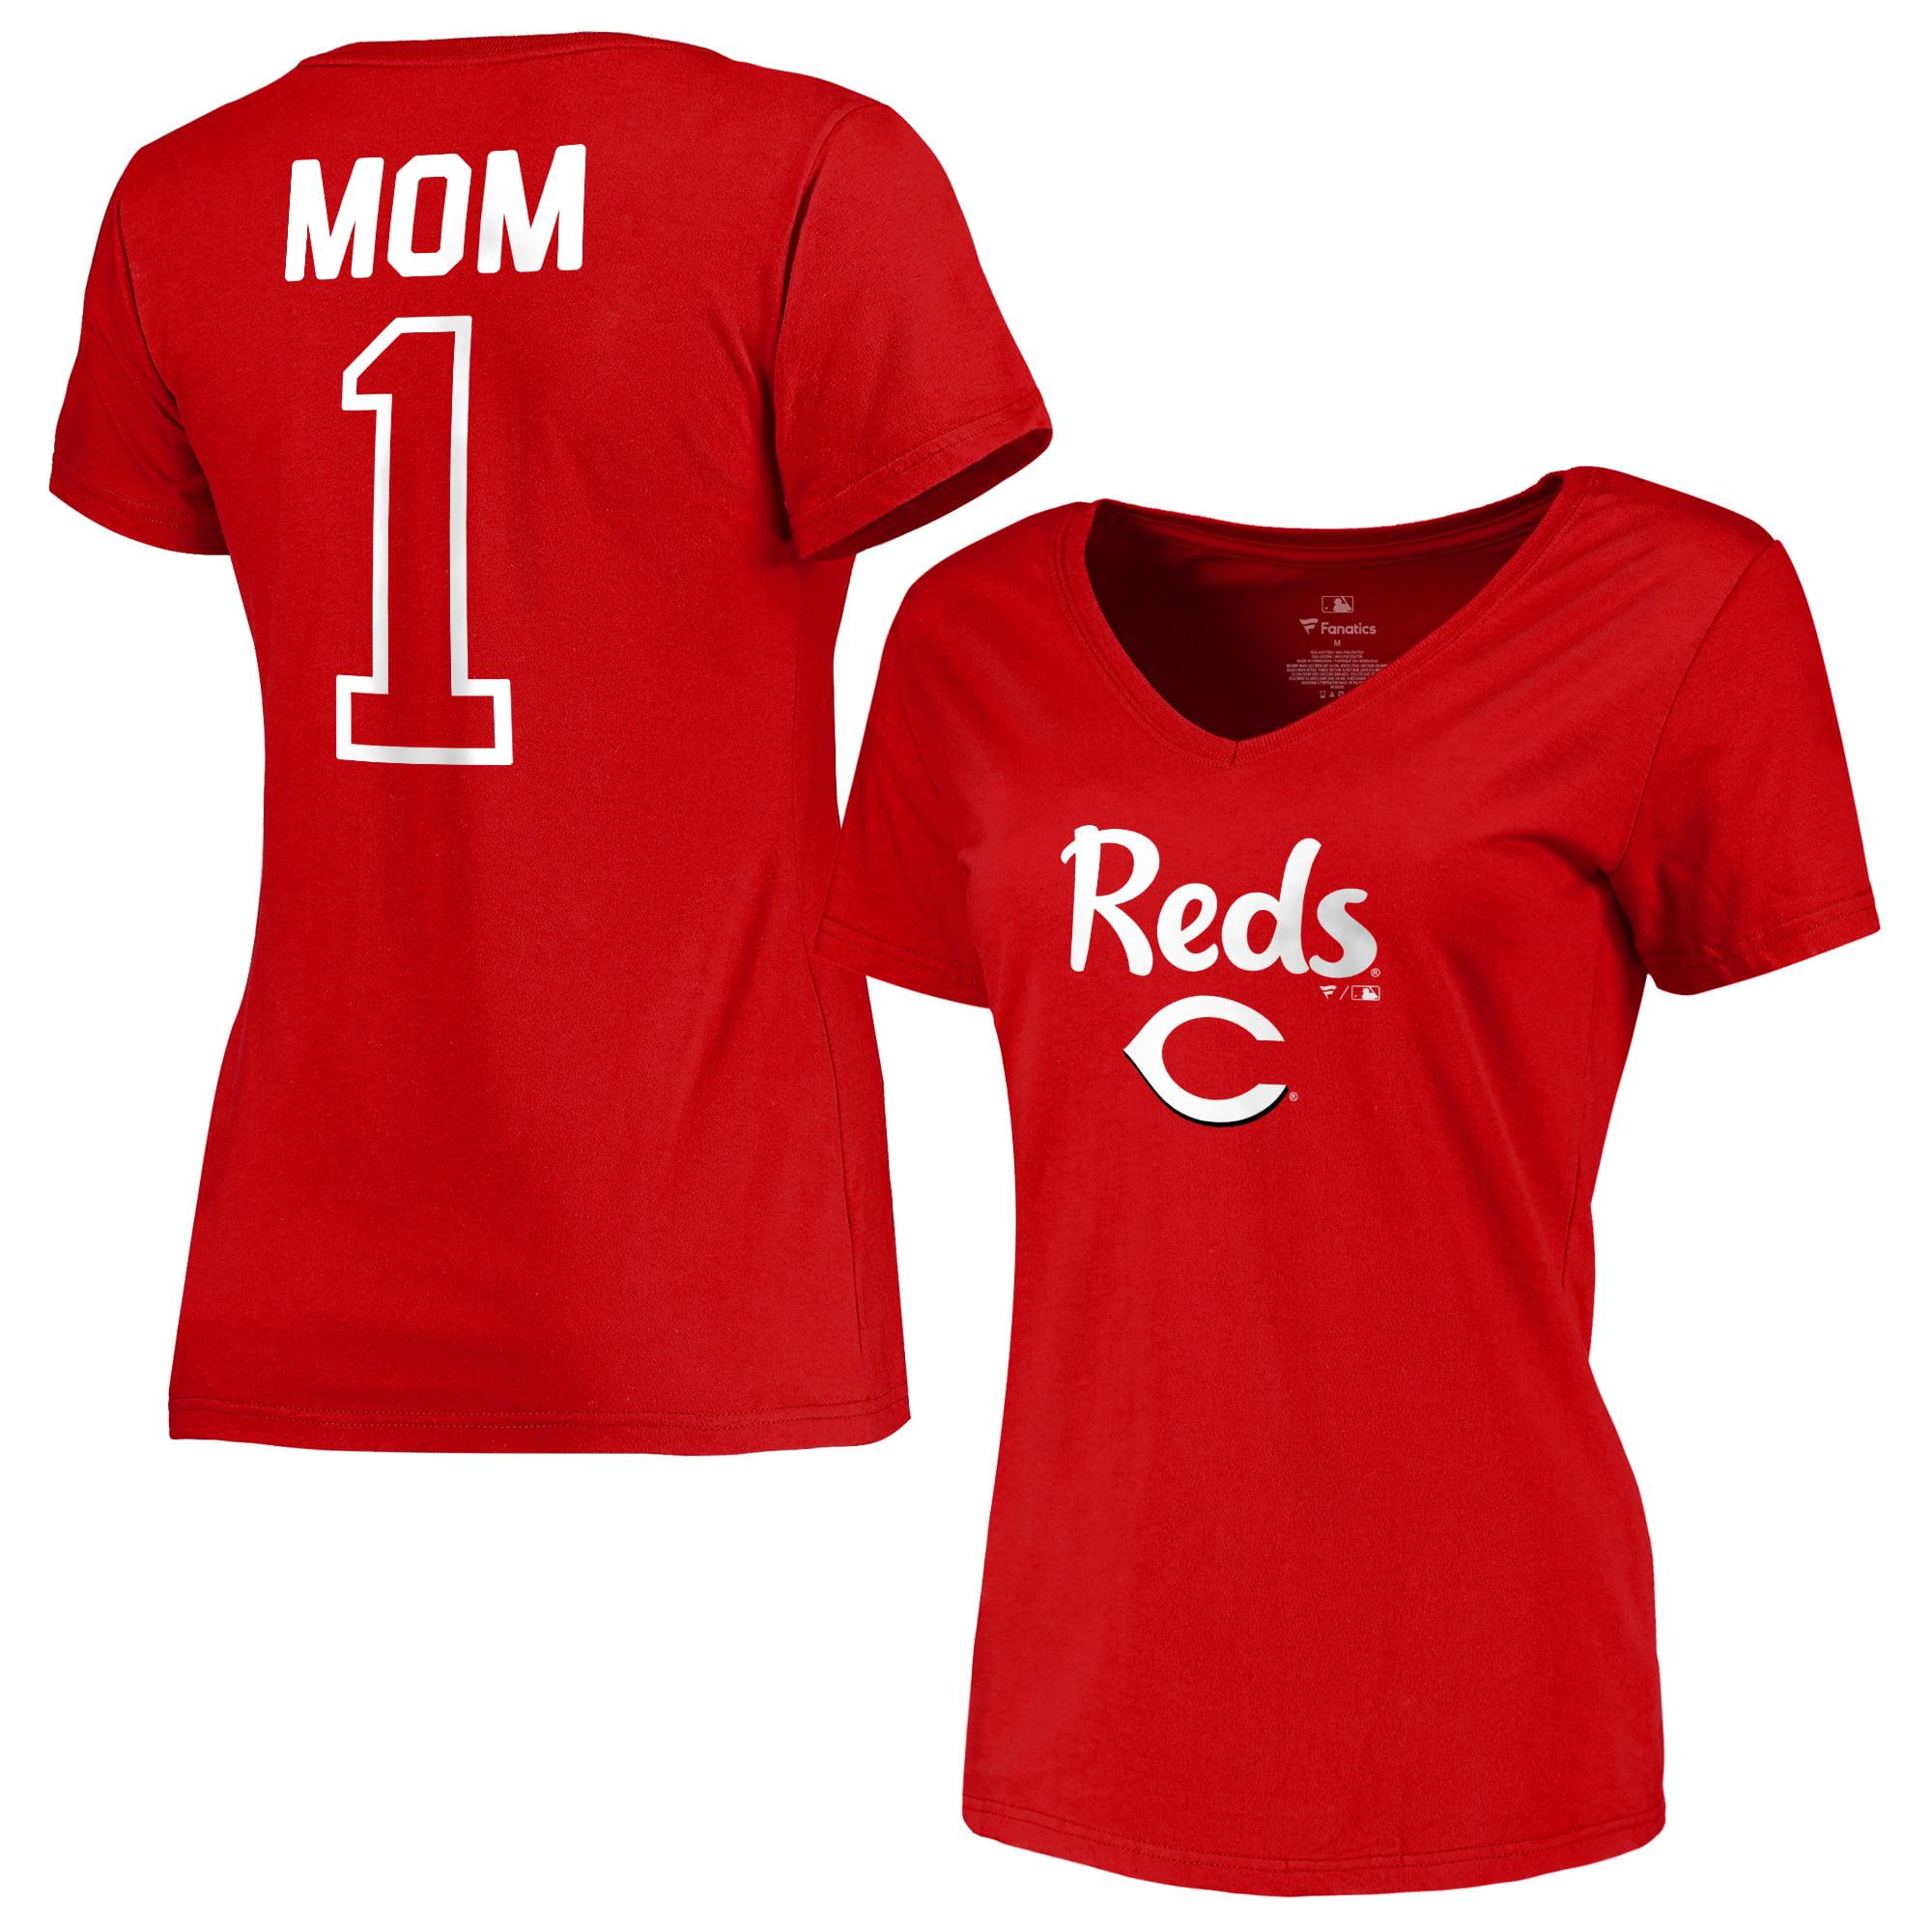 Cincinnati Reds Fanatics Branded Women's 2018 Mother's Day #1 Mom V-Neck T-Shirt - Red